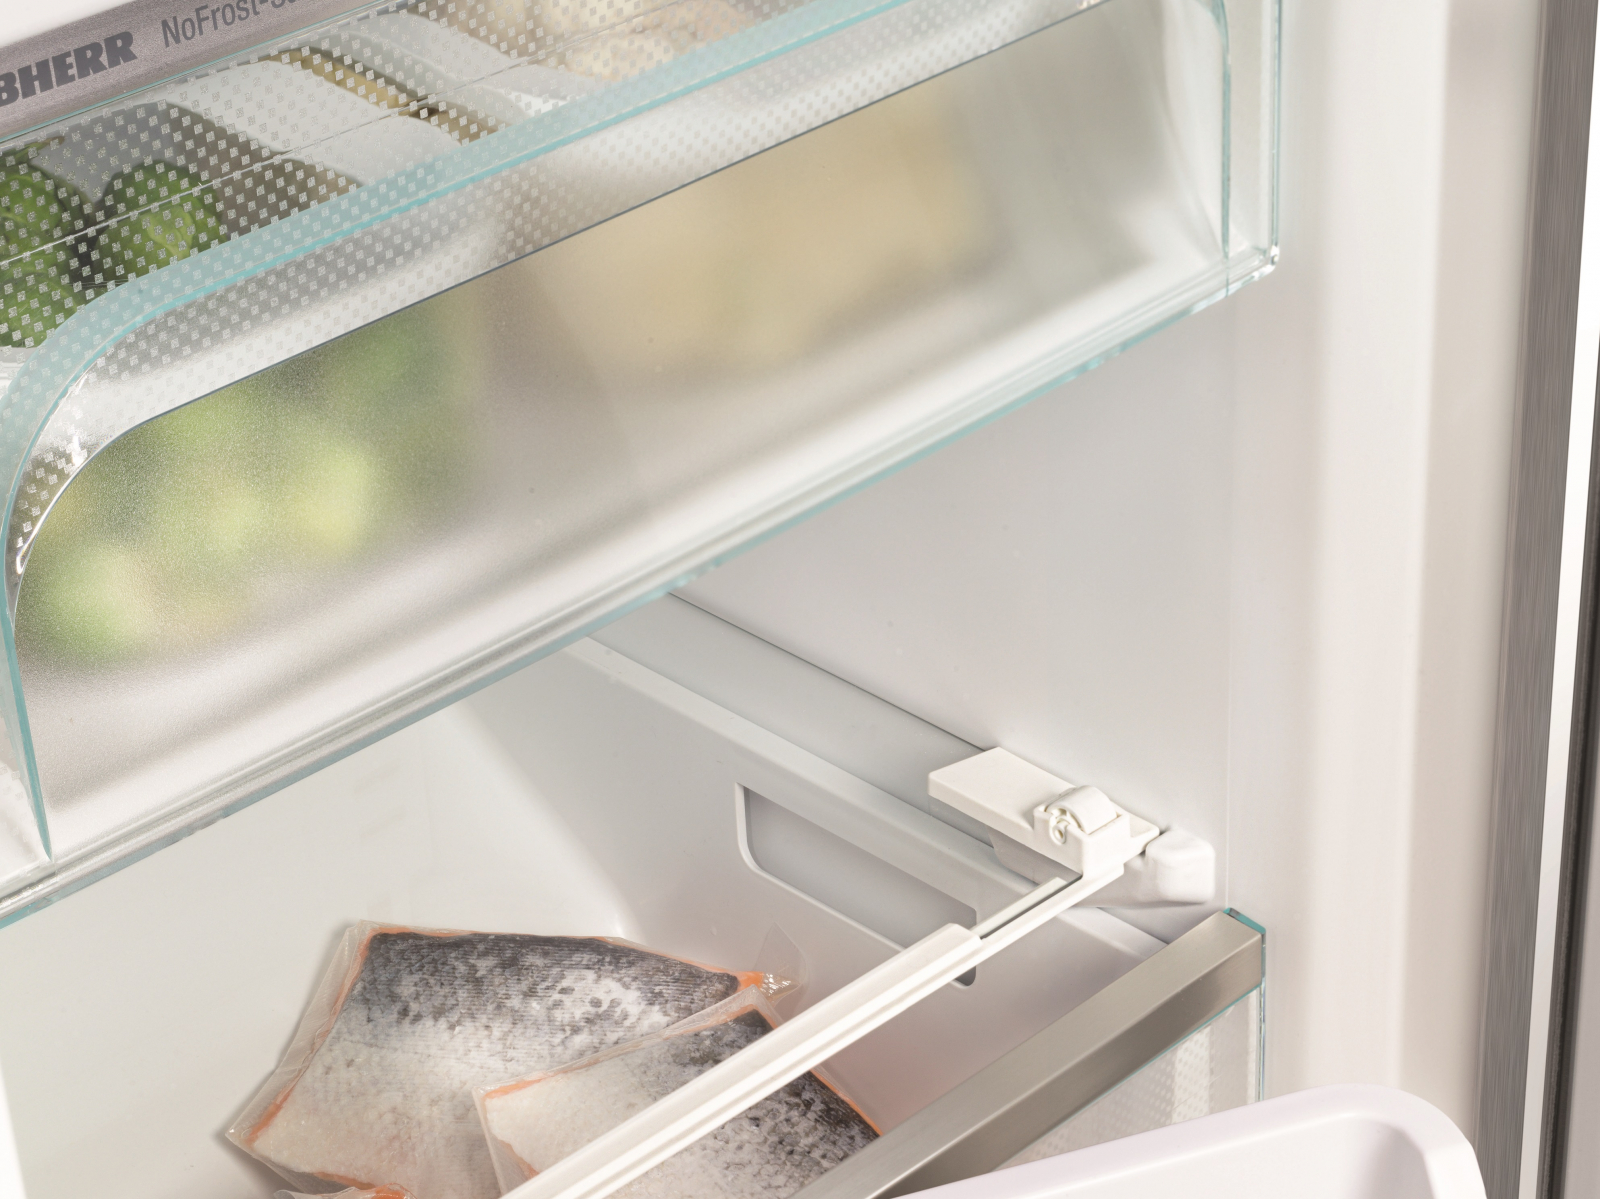 купить Side-by-Side холодильник Liebherr SBSes 8663 Украина фото 15